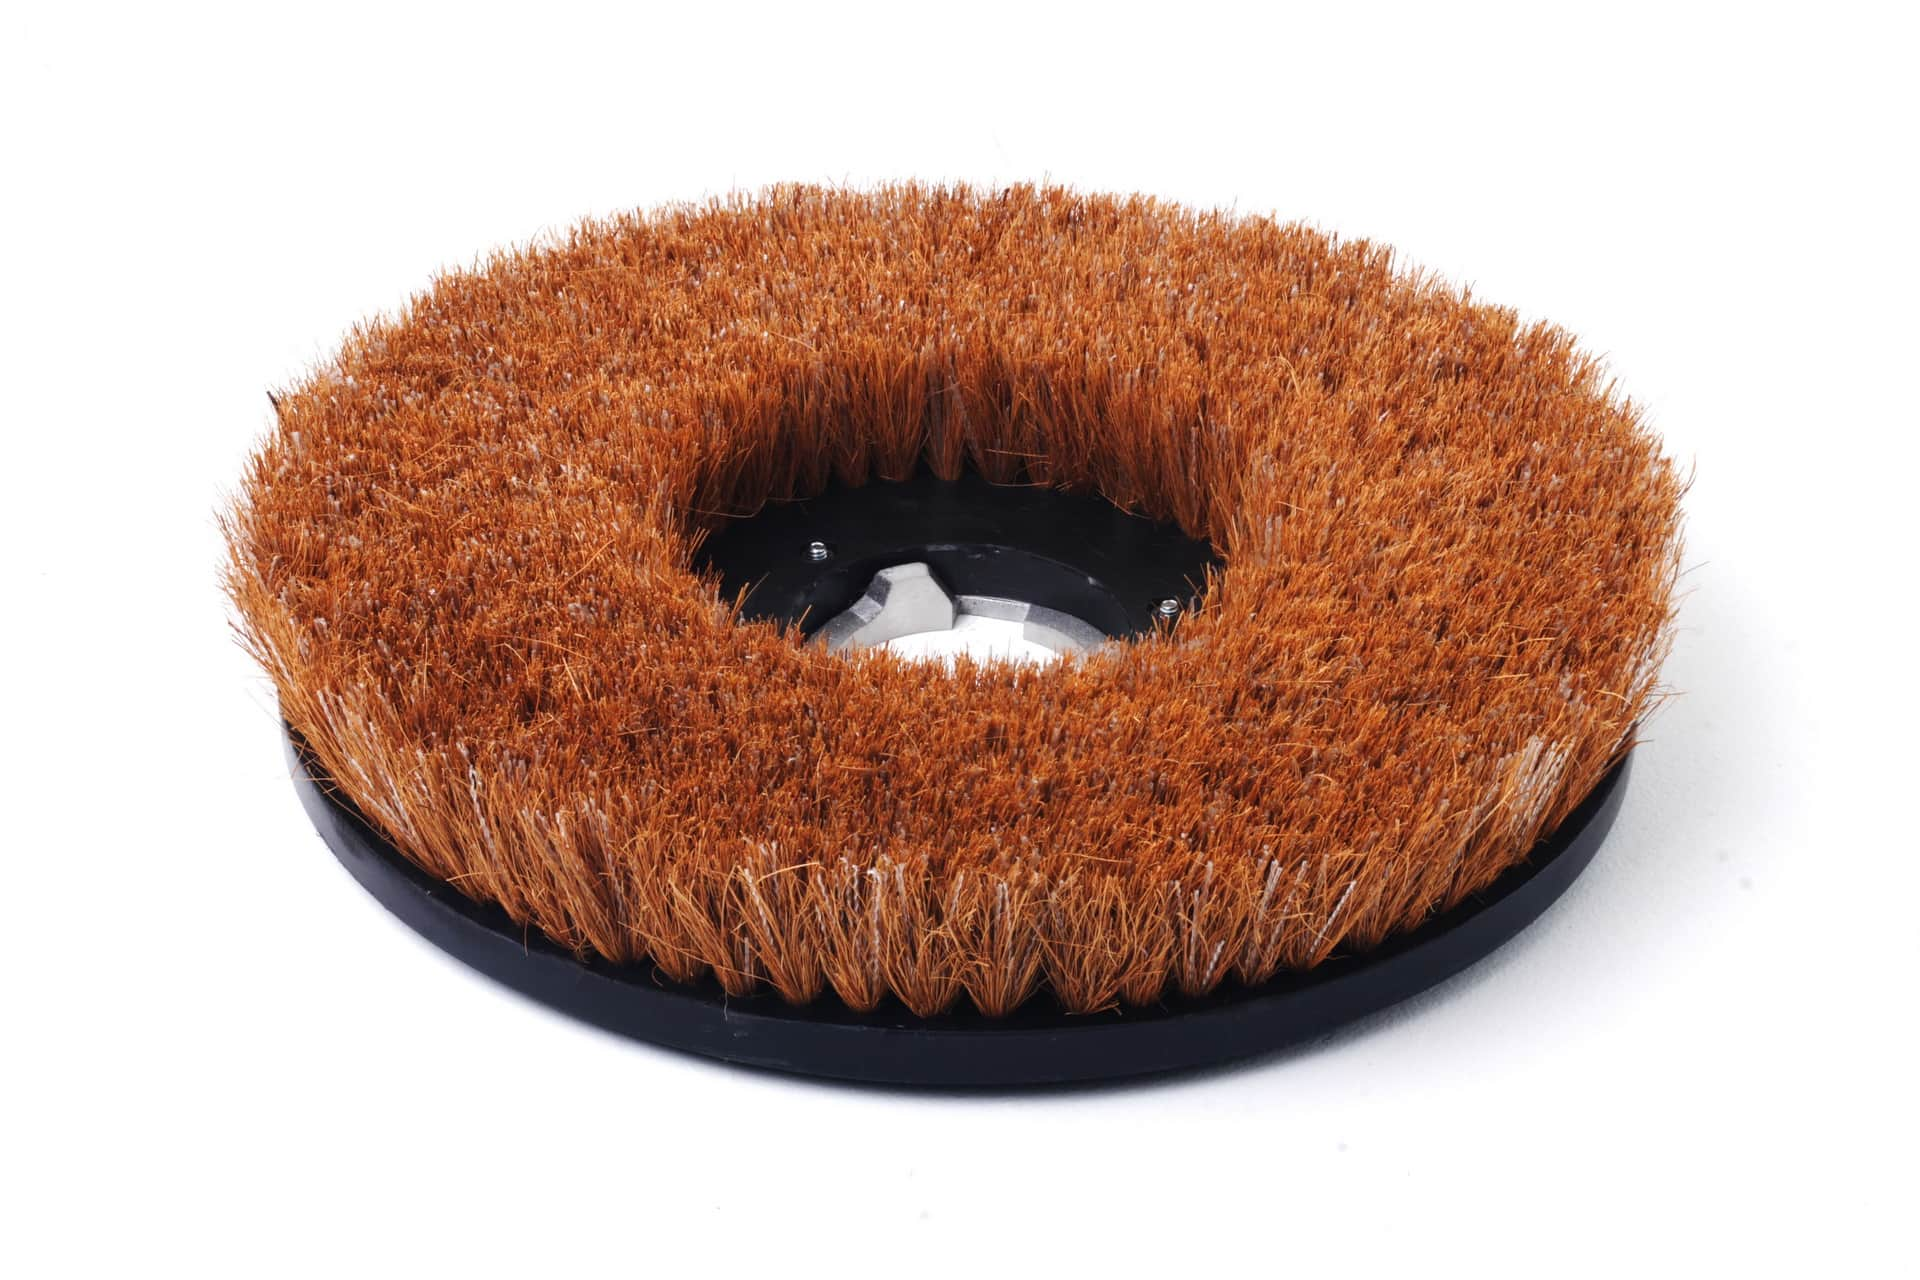 champion_coconut_fibre_polisher_brush_แปรงกากมะพร้าวอ่อนขัดเงาพื้น_01